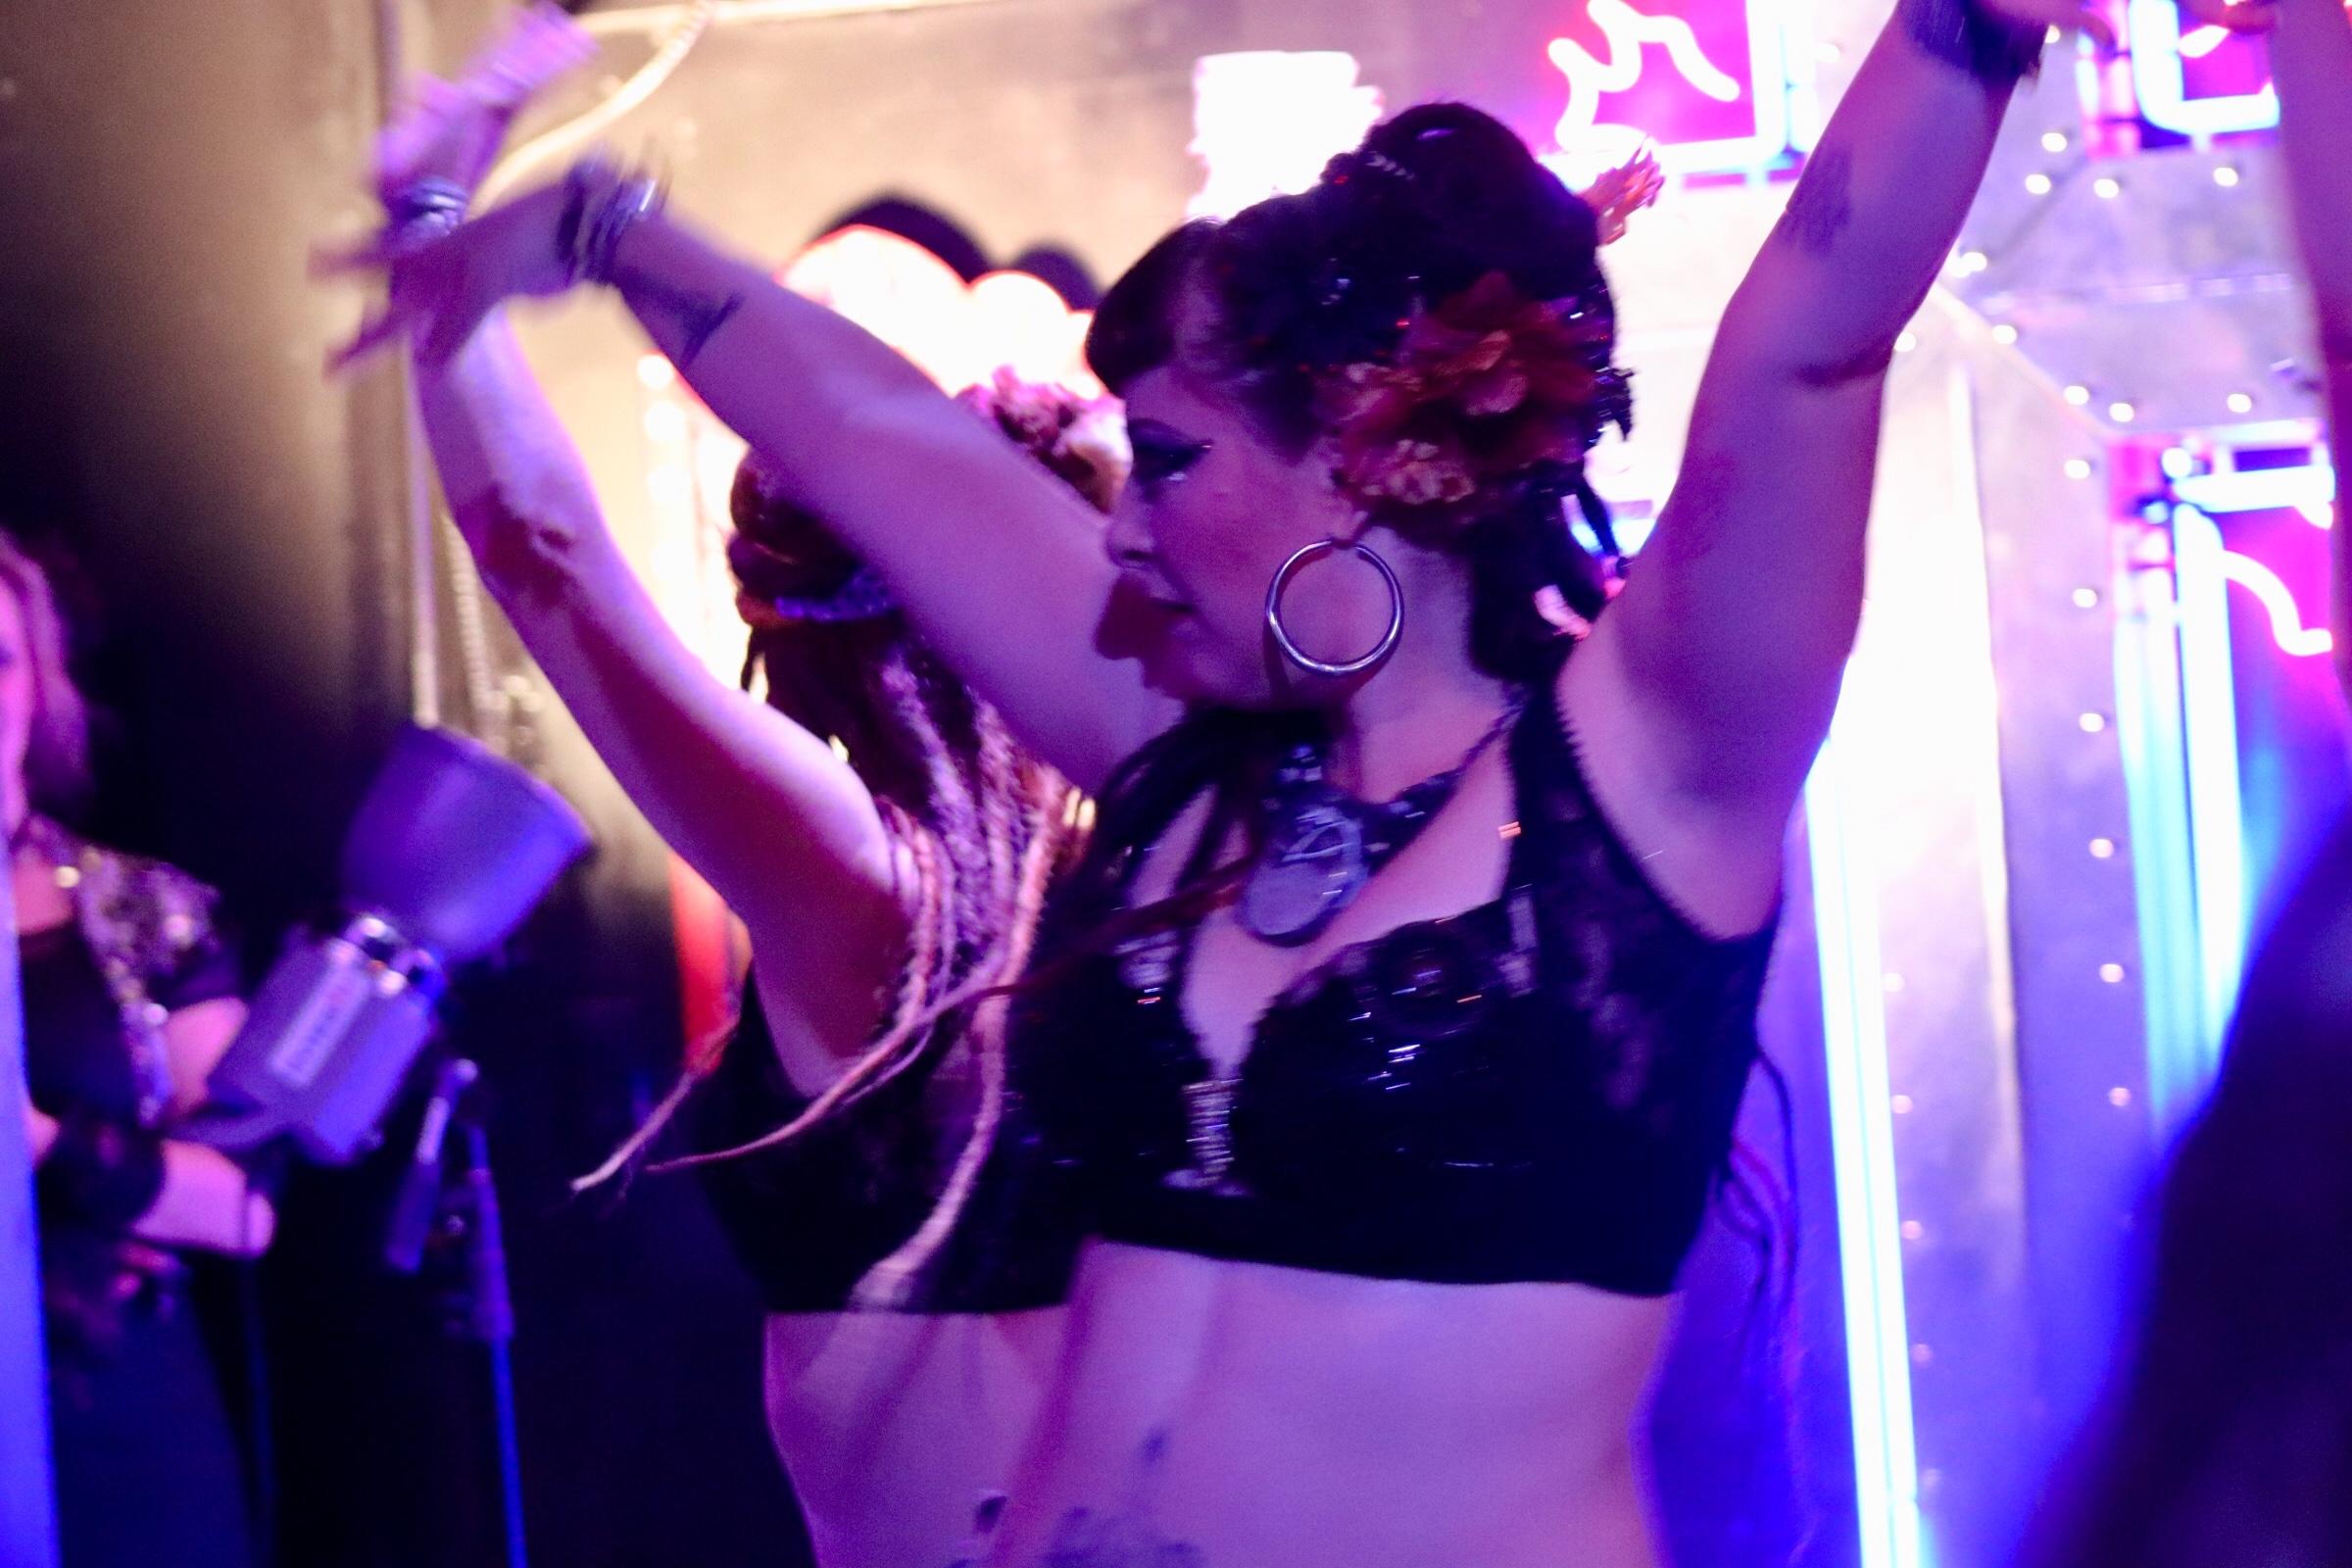 Danse Carouselle entertains a mesmerized crowd